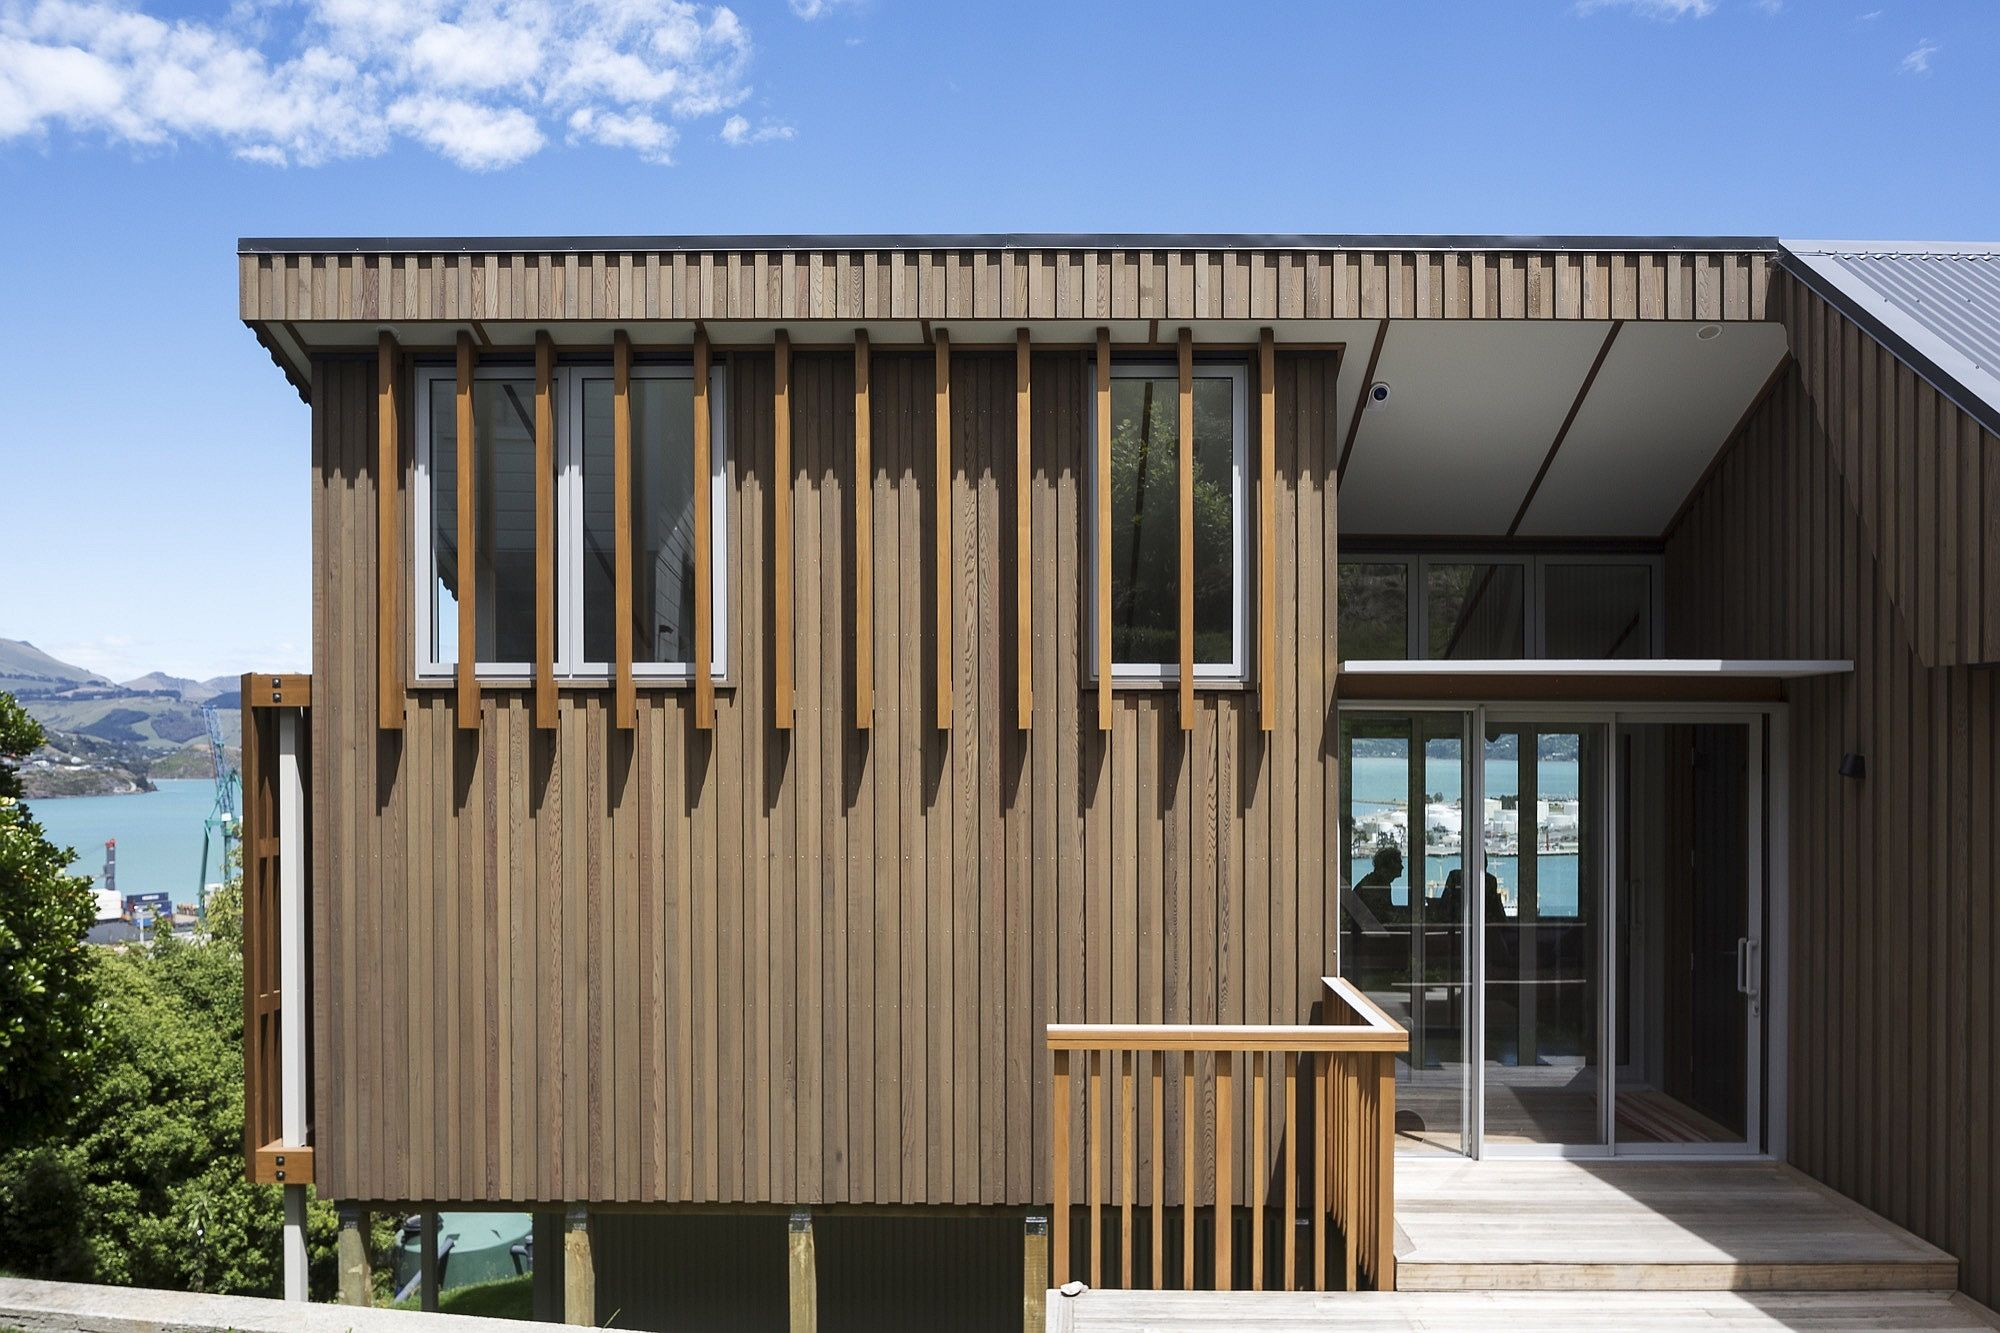 Quake hit villa replaced by a modern home in Christchurch